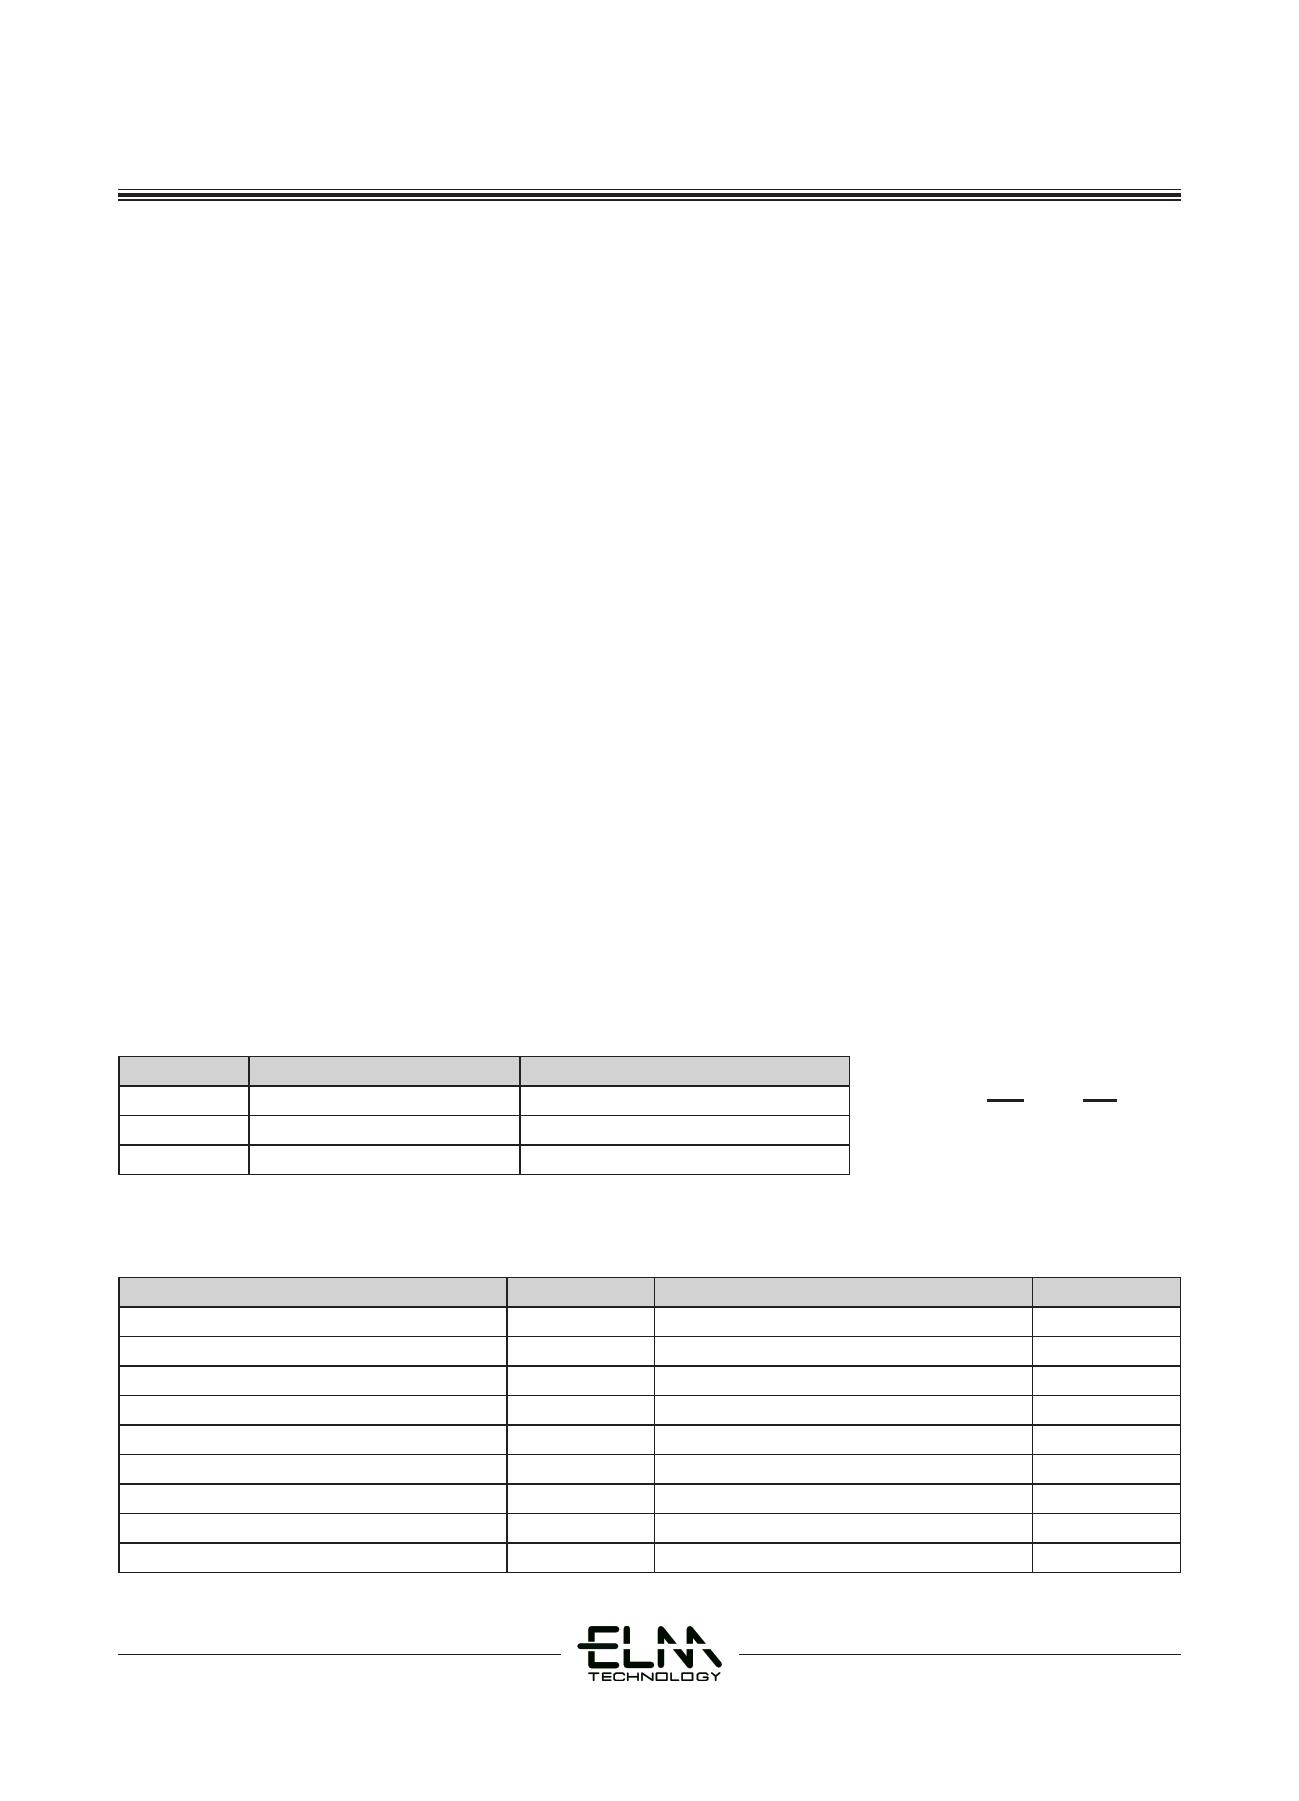 ELM7S00B Datasheet, ELM7S00B PDF,ピン配置, 機能